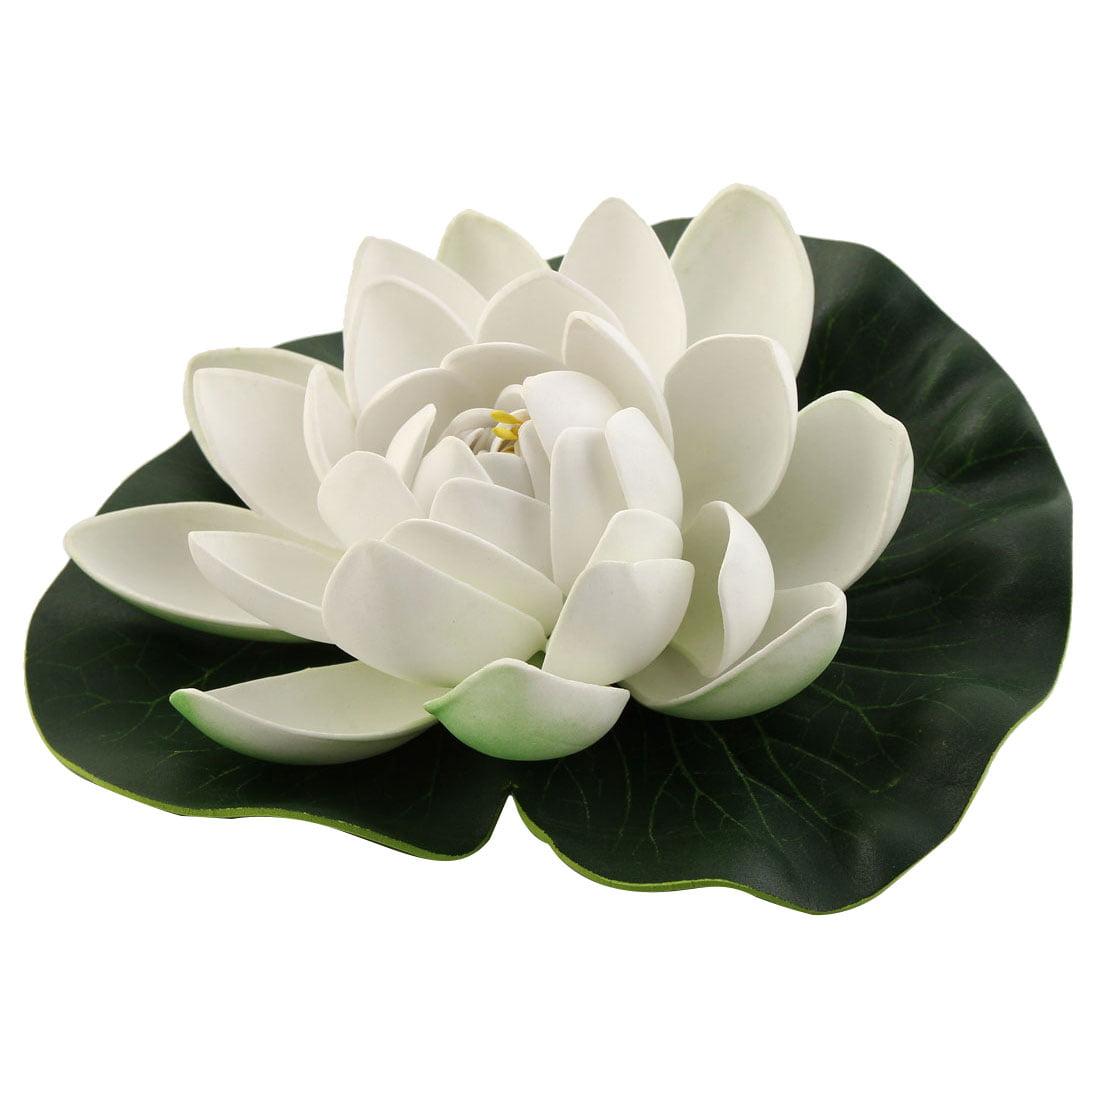 Aquarium Fish Tank Foam Artificial Floating Lotus Flower Decor Ornament